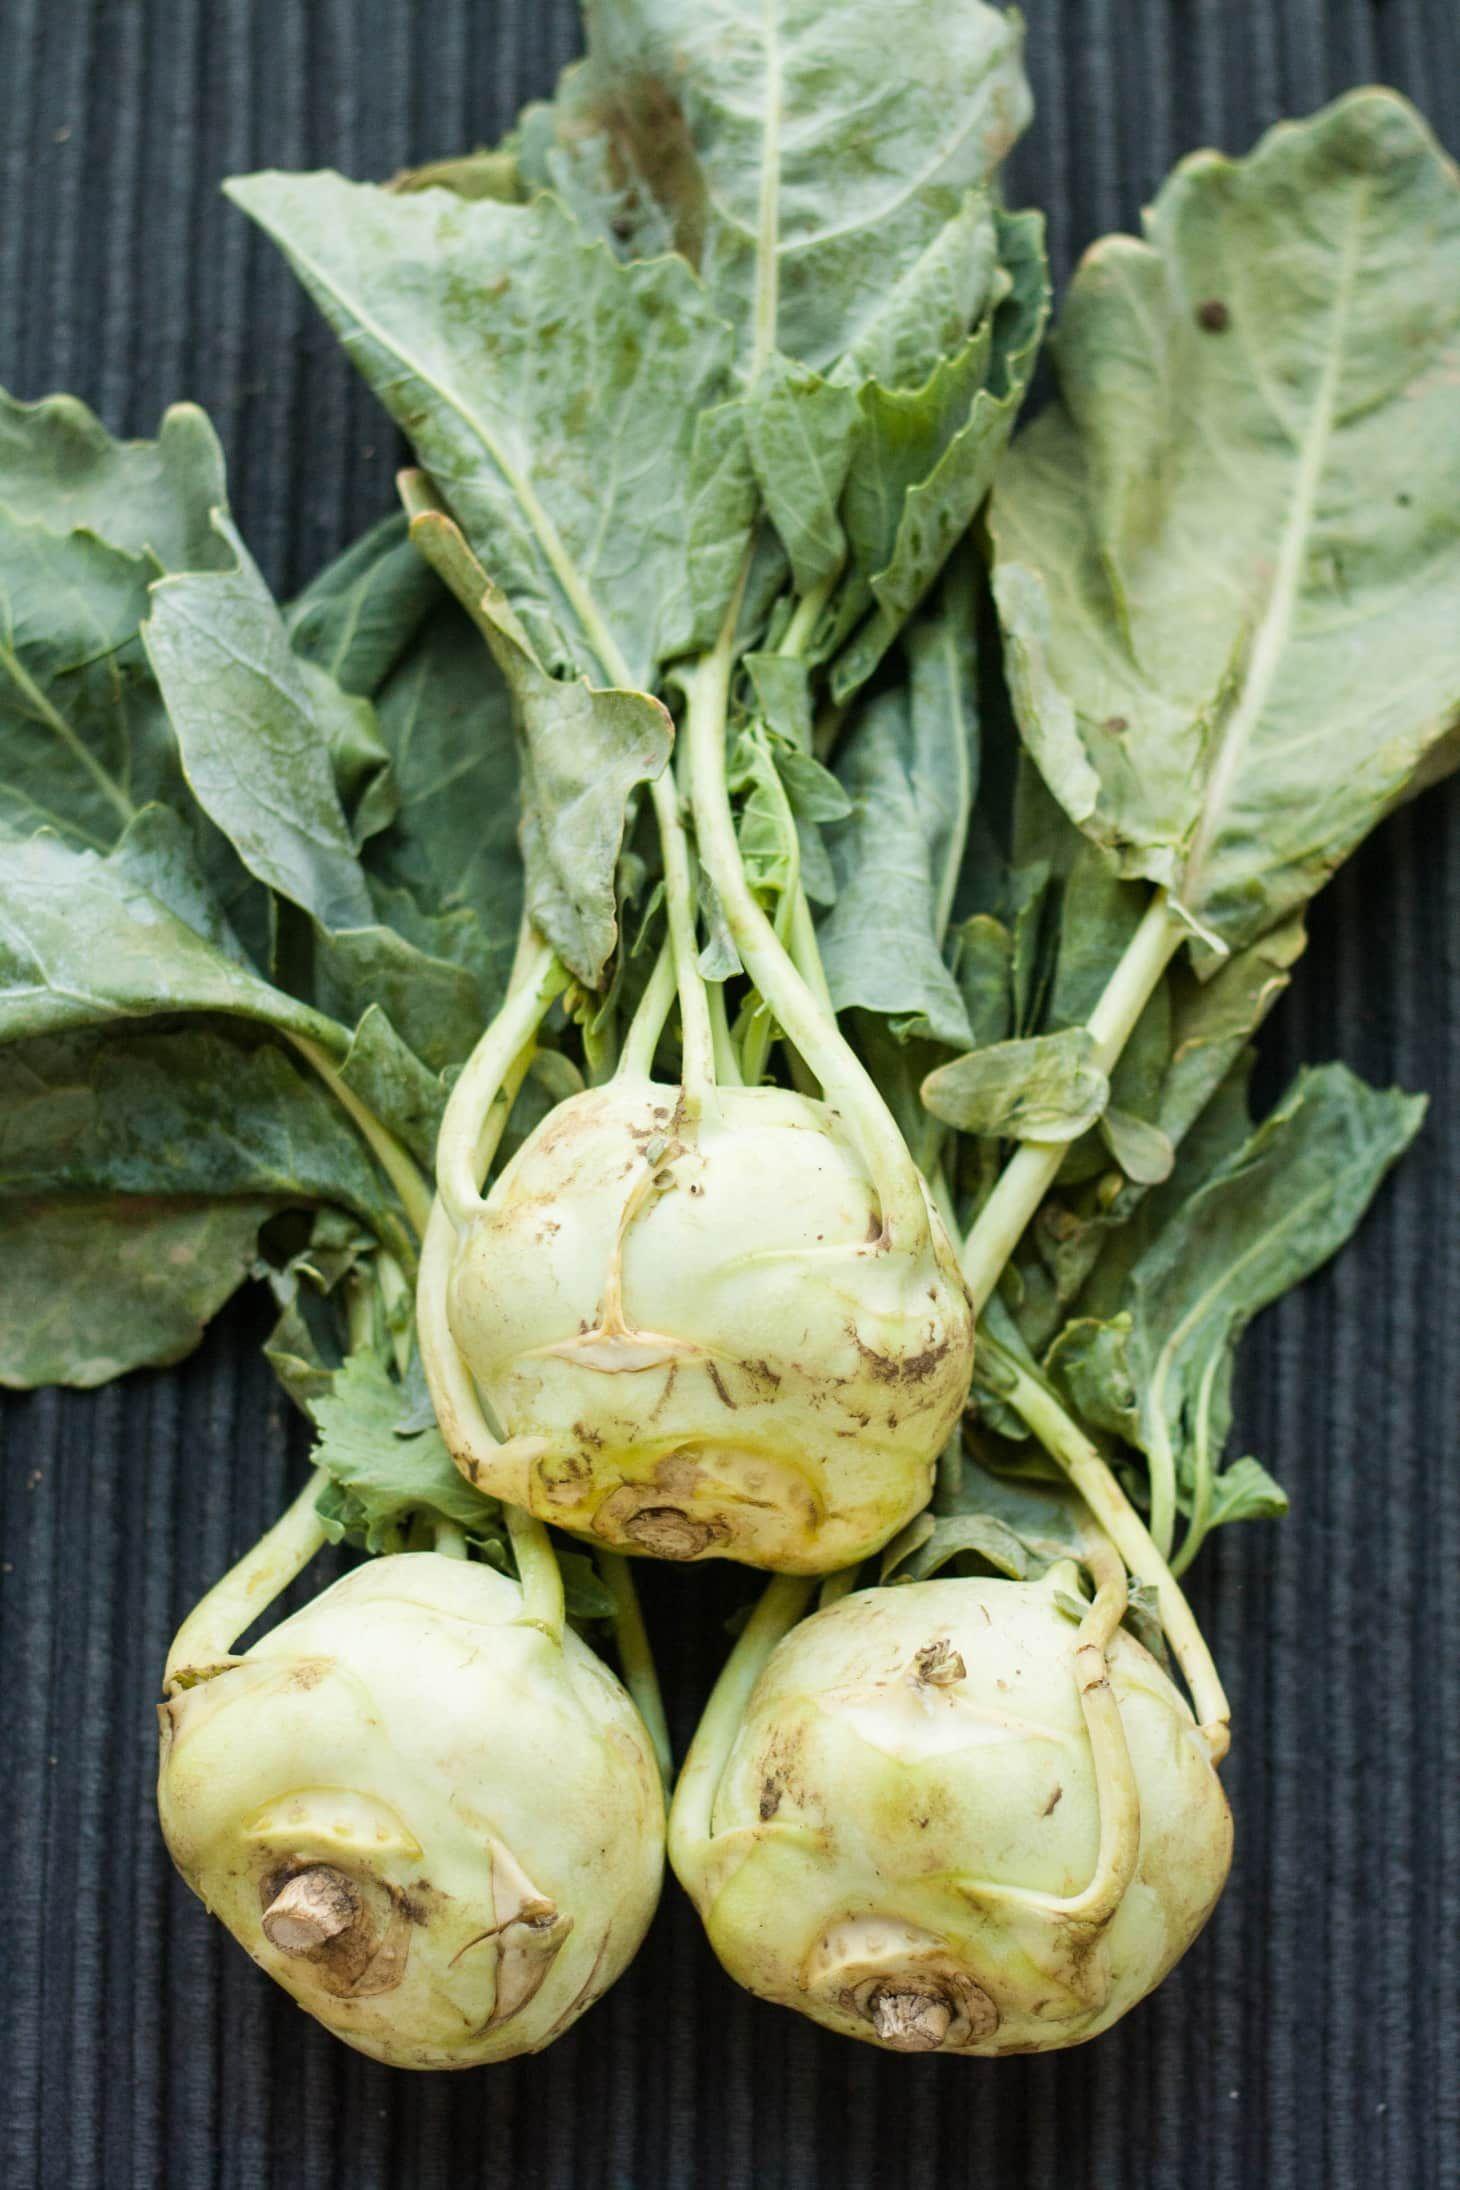 5 Tasty Ways To Prepare Kohlrabi Roasted Kohlrabi Kohlrabi Recipes Kohlrabi